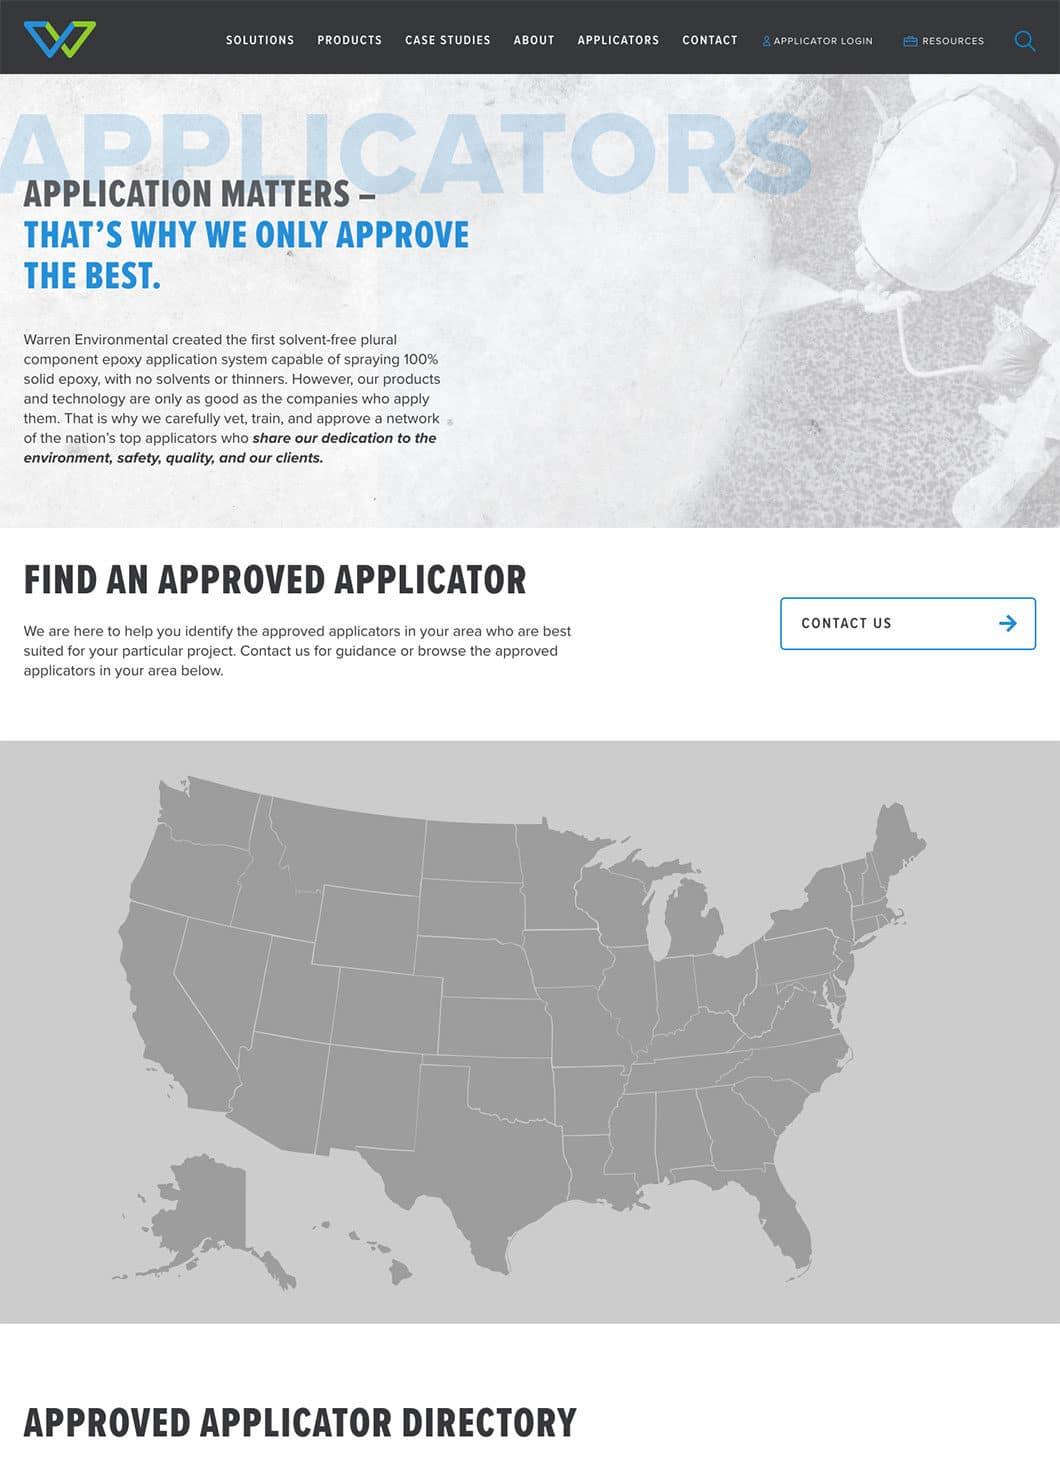 Warren Environmental Applicators screenshot